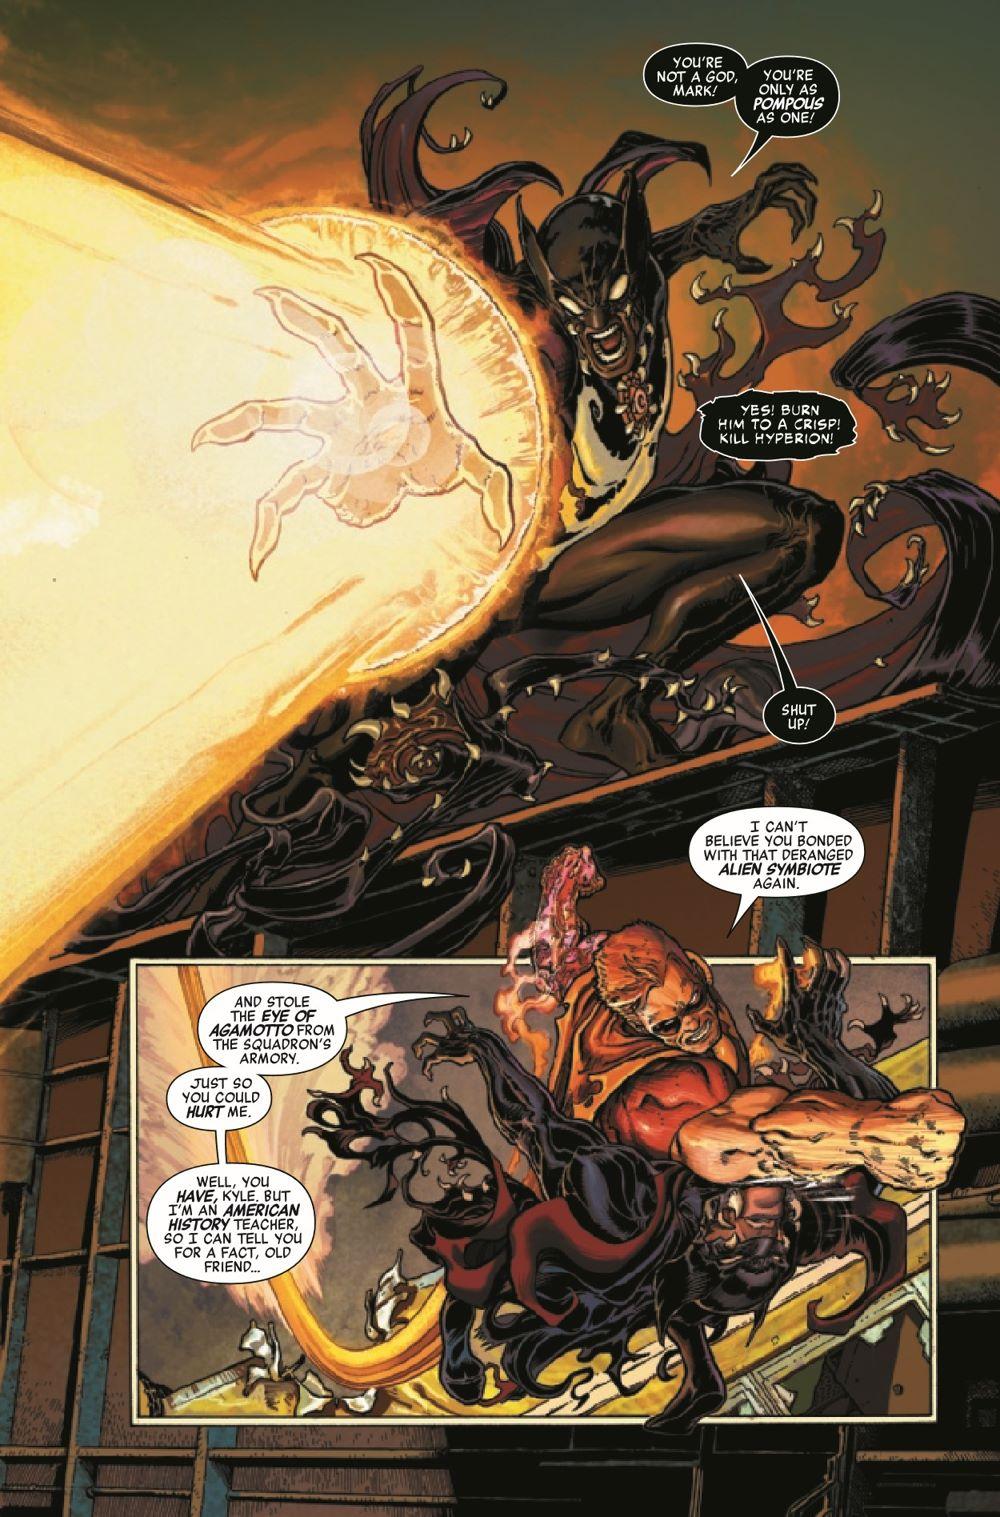 HEROESREBORN2021007_Preview-4 ComicList Previews: HEROES REBORN #7 (OF 7)